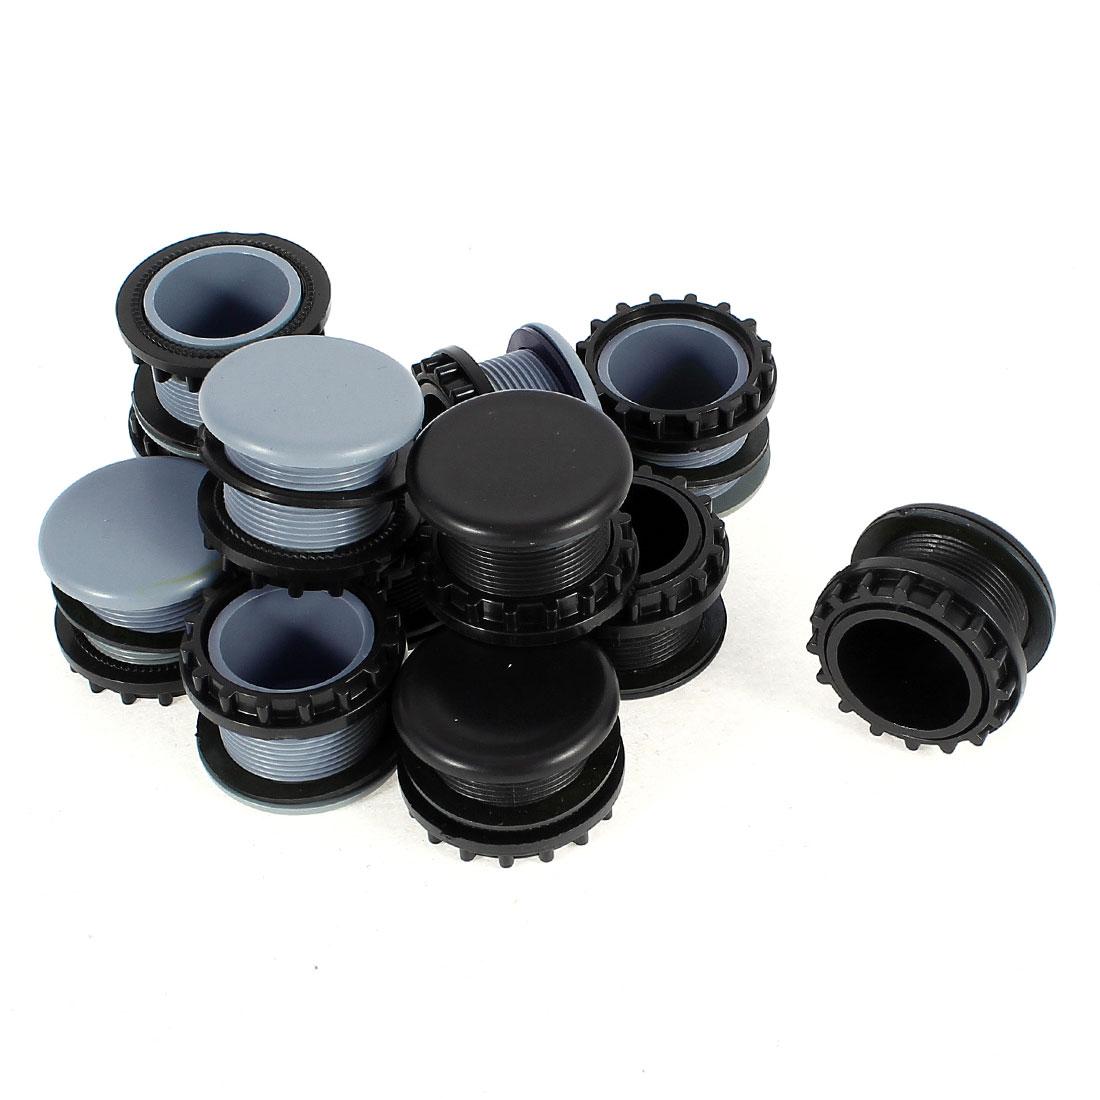 12 Pcs Black + Gray Plastic Push Button Switch 22mm Mount Hole Panel Plug Cover Cap